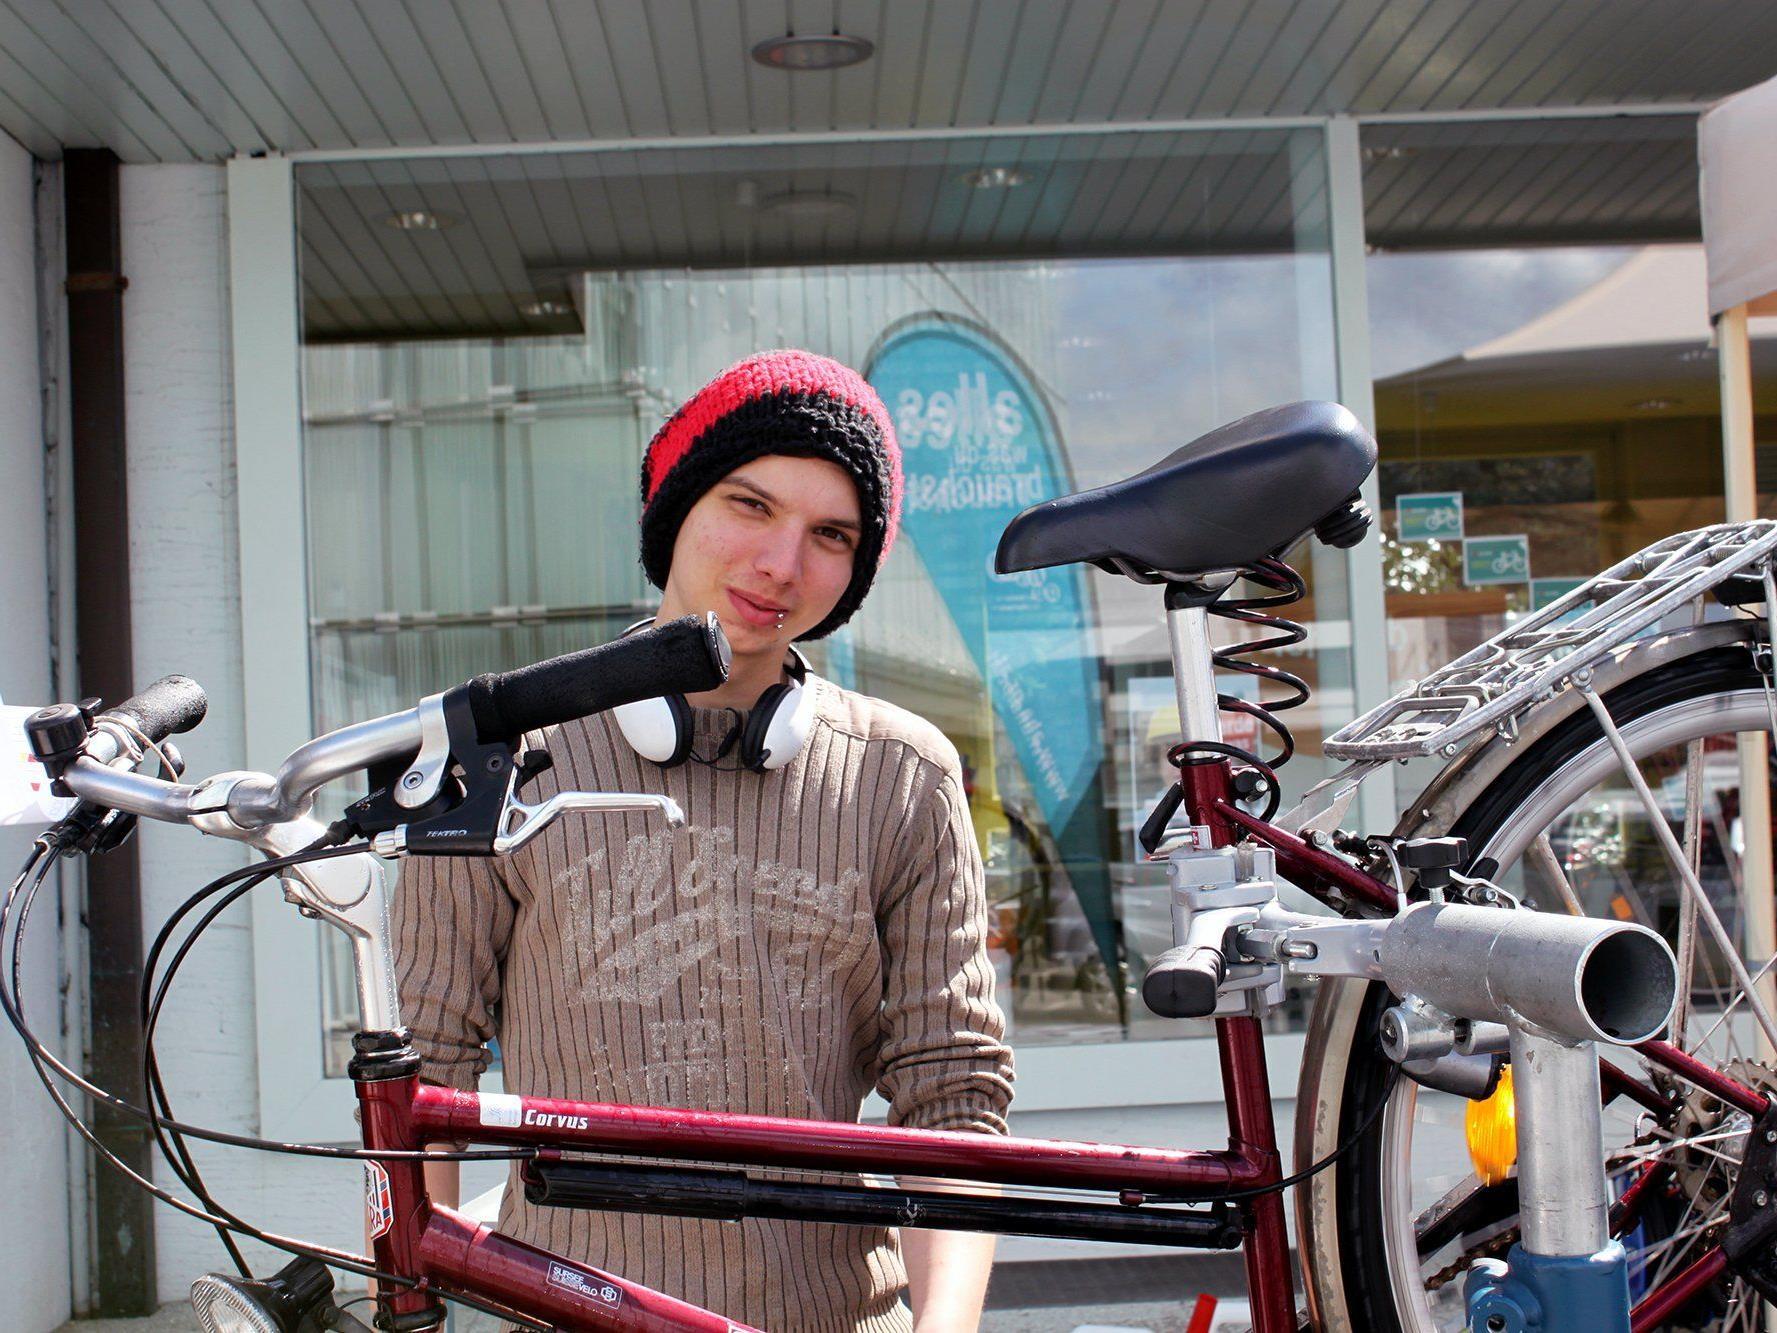 Fahrradcheck im aha